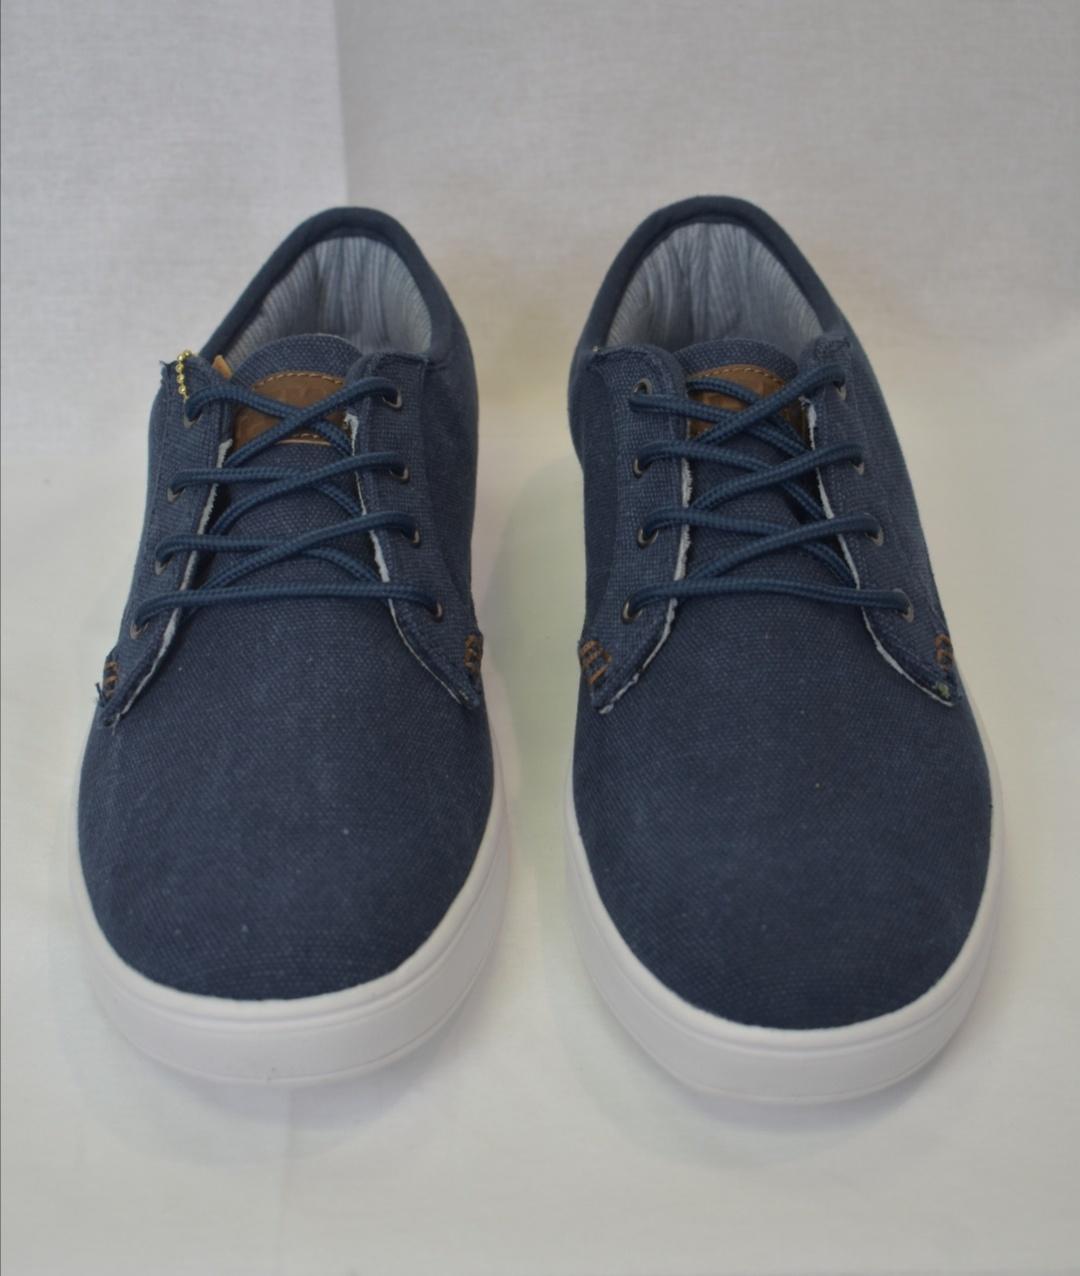 Montreal shoe,